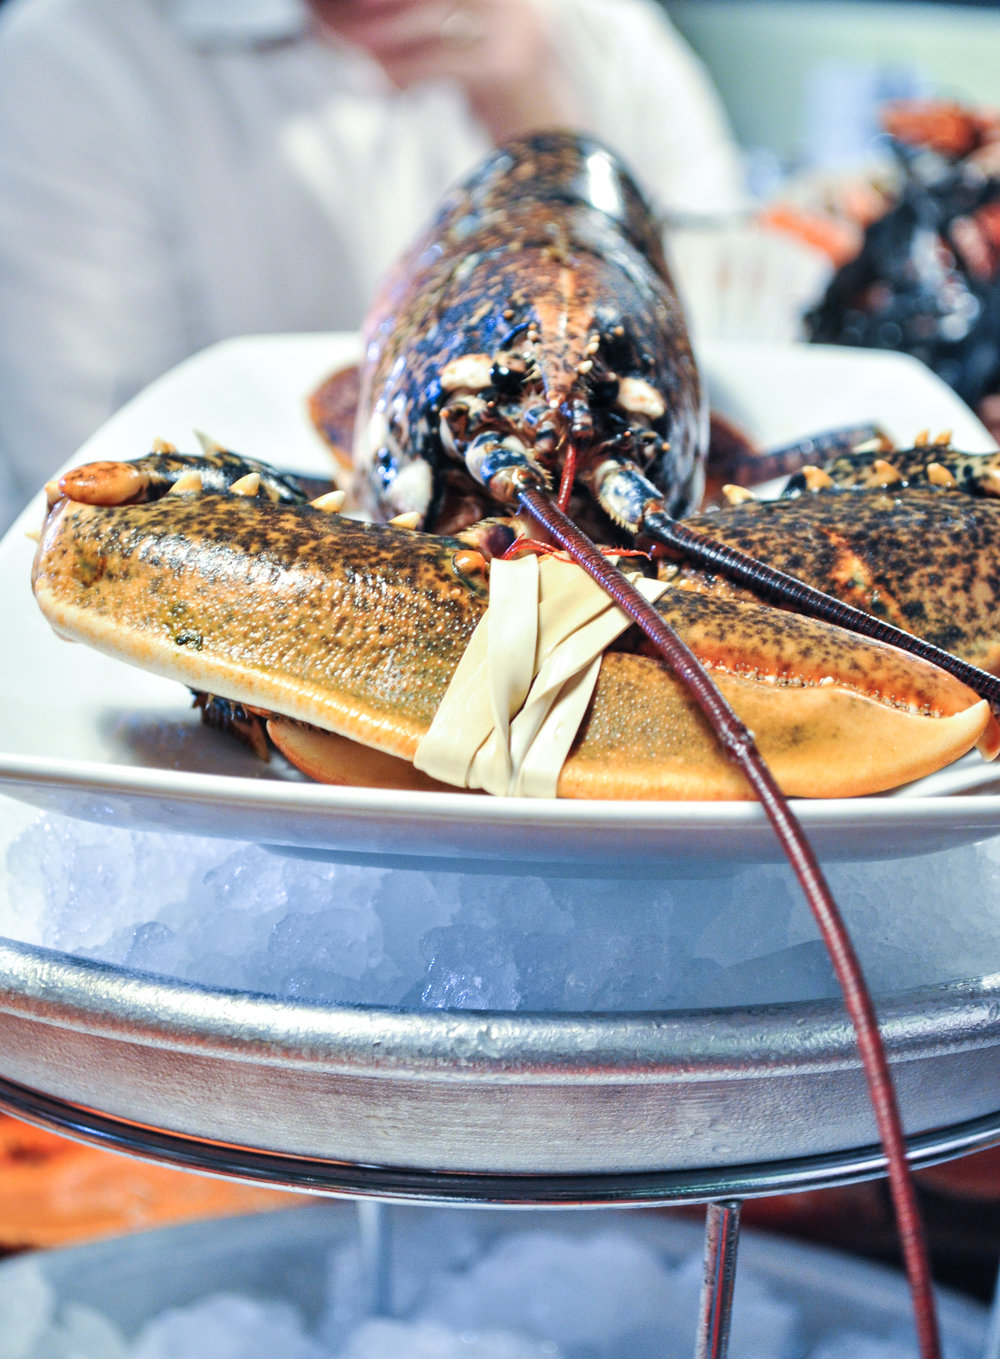 Pescatori-27.jpg